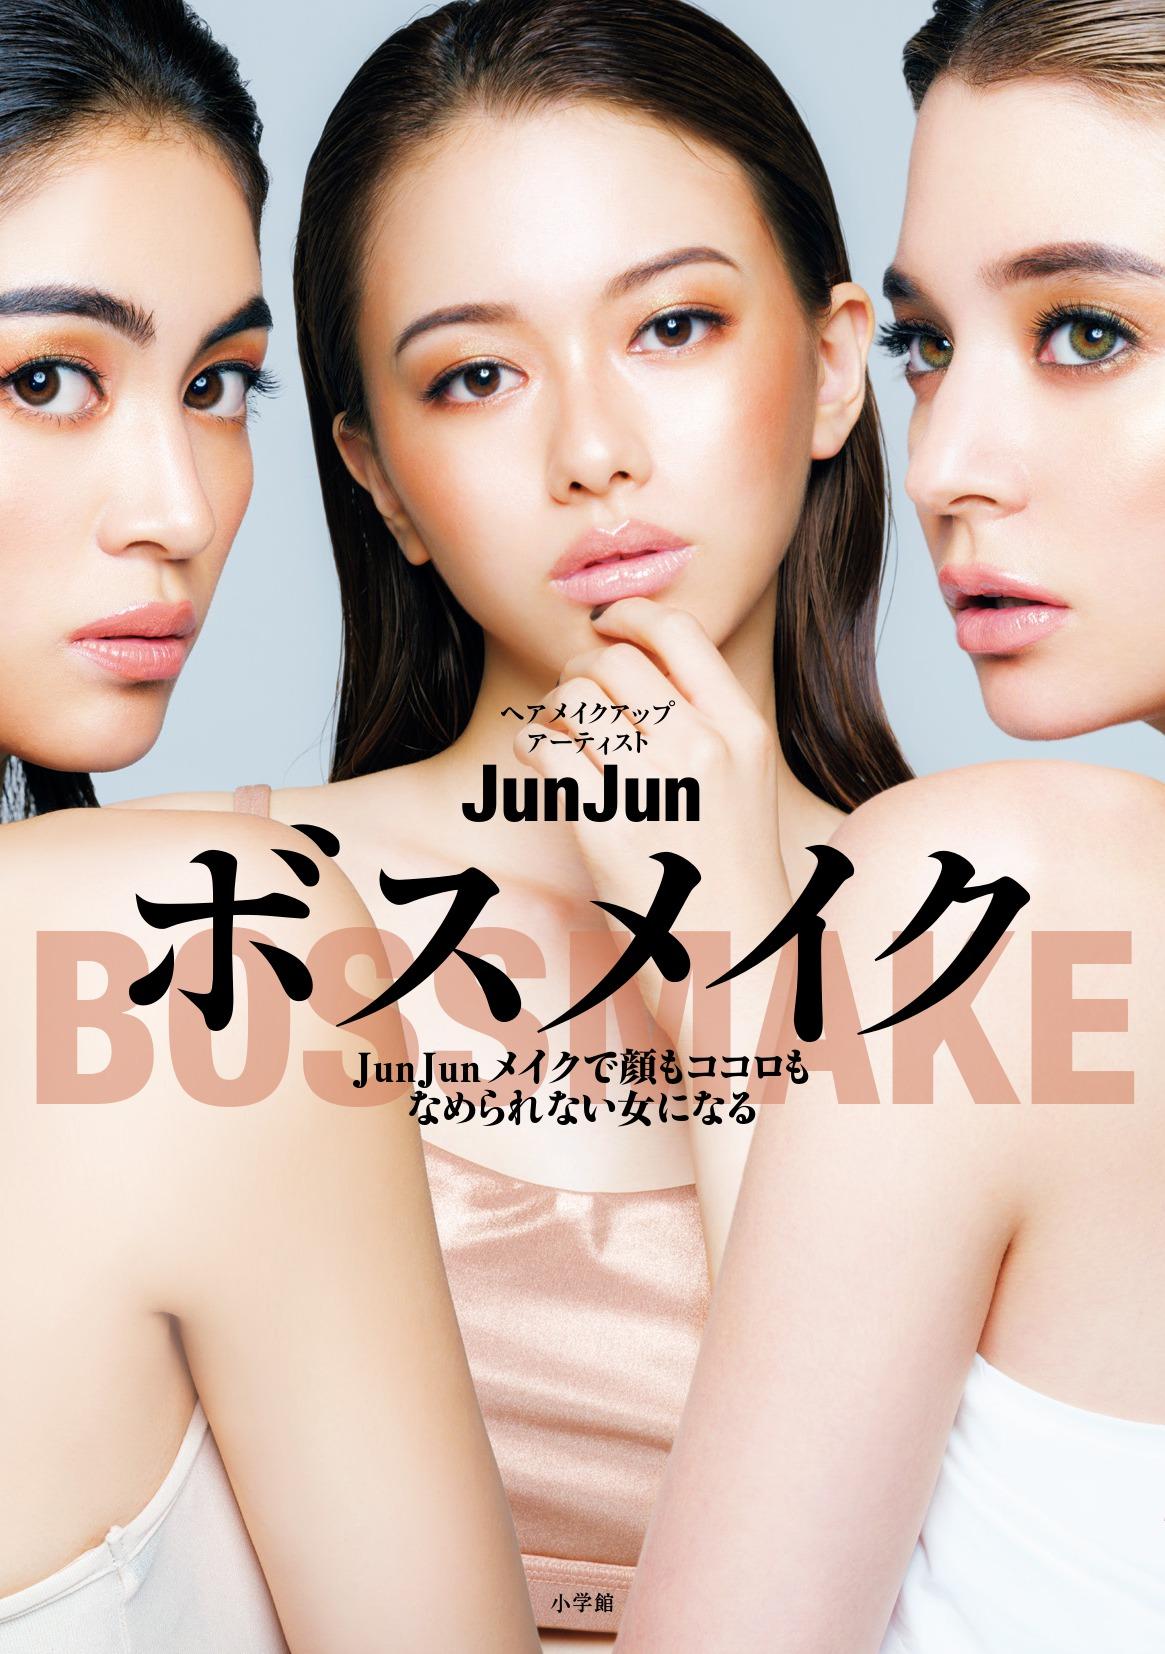 JunJun BOSSMAKE TOUR 2019 4月19日(金)大阪公演